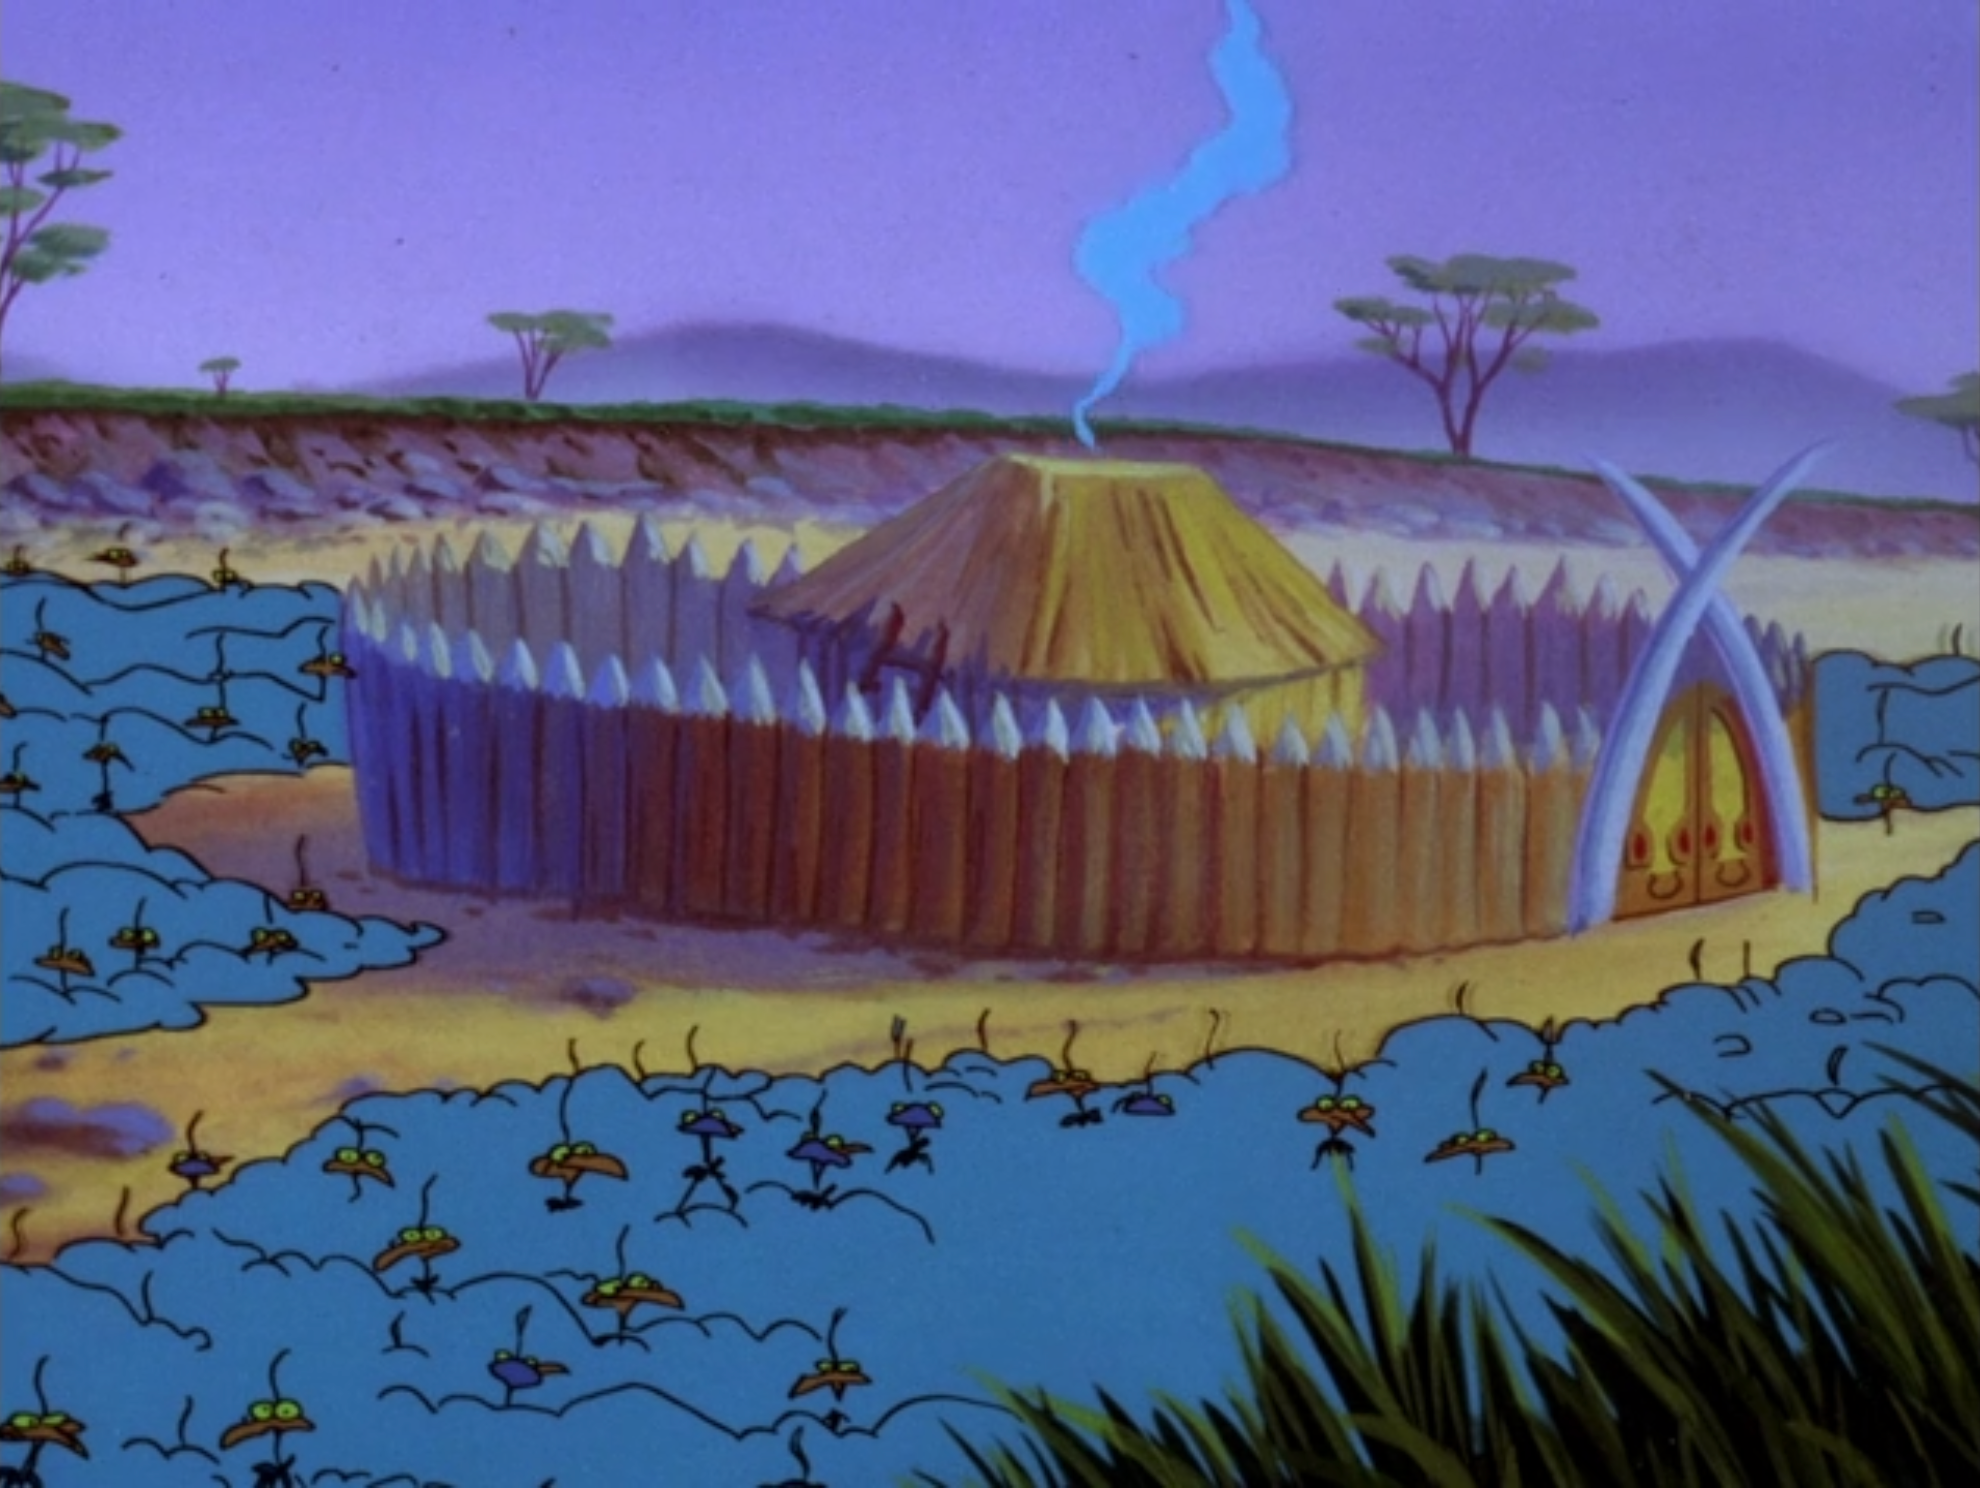 Warthogs' hut